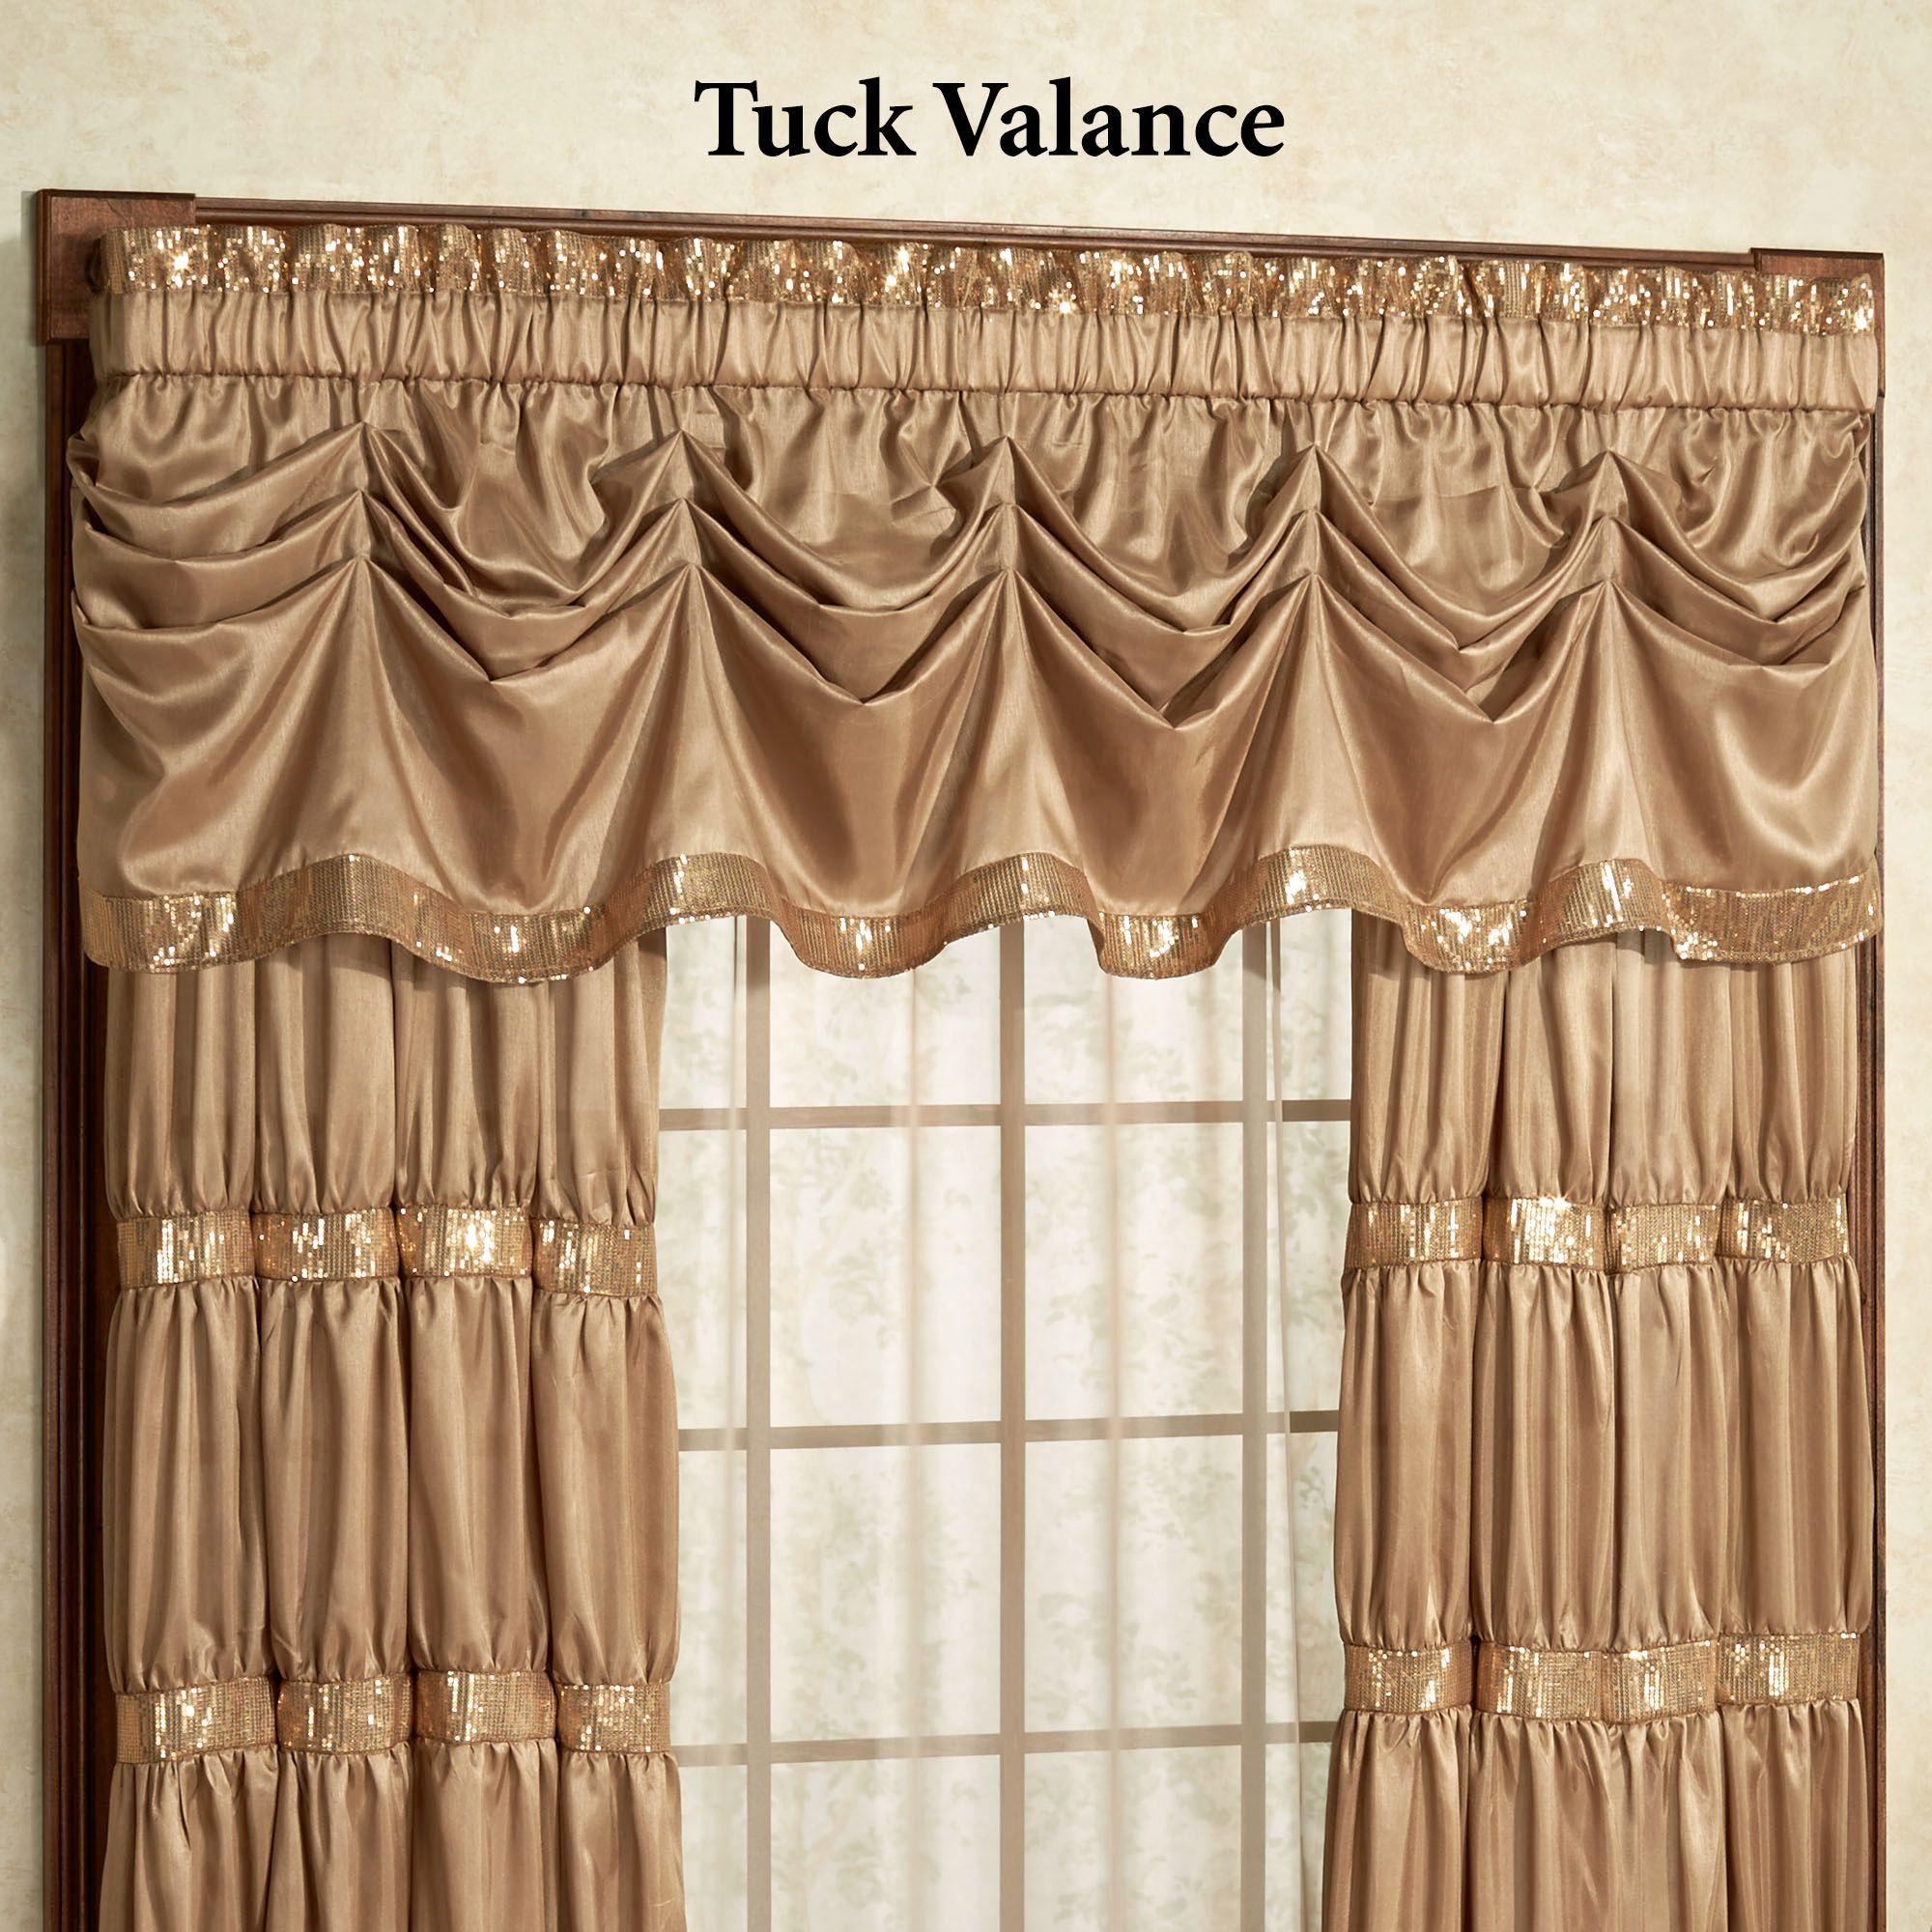 shower curtains size nature full splendor hooks coffee doors nautical imposing of bicycle fall bear ideas curtain theme tables themed set curtainsd photos